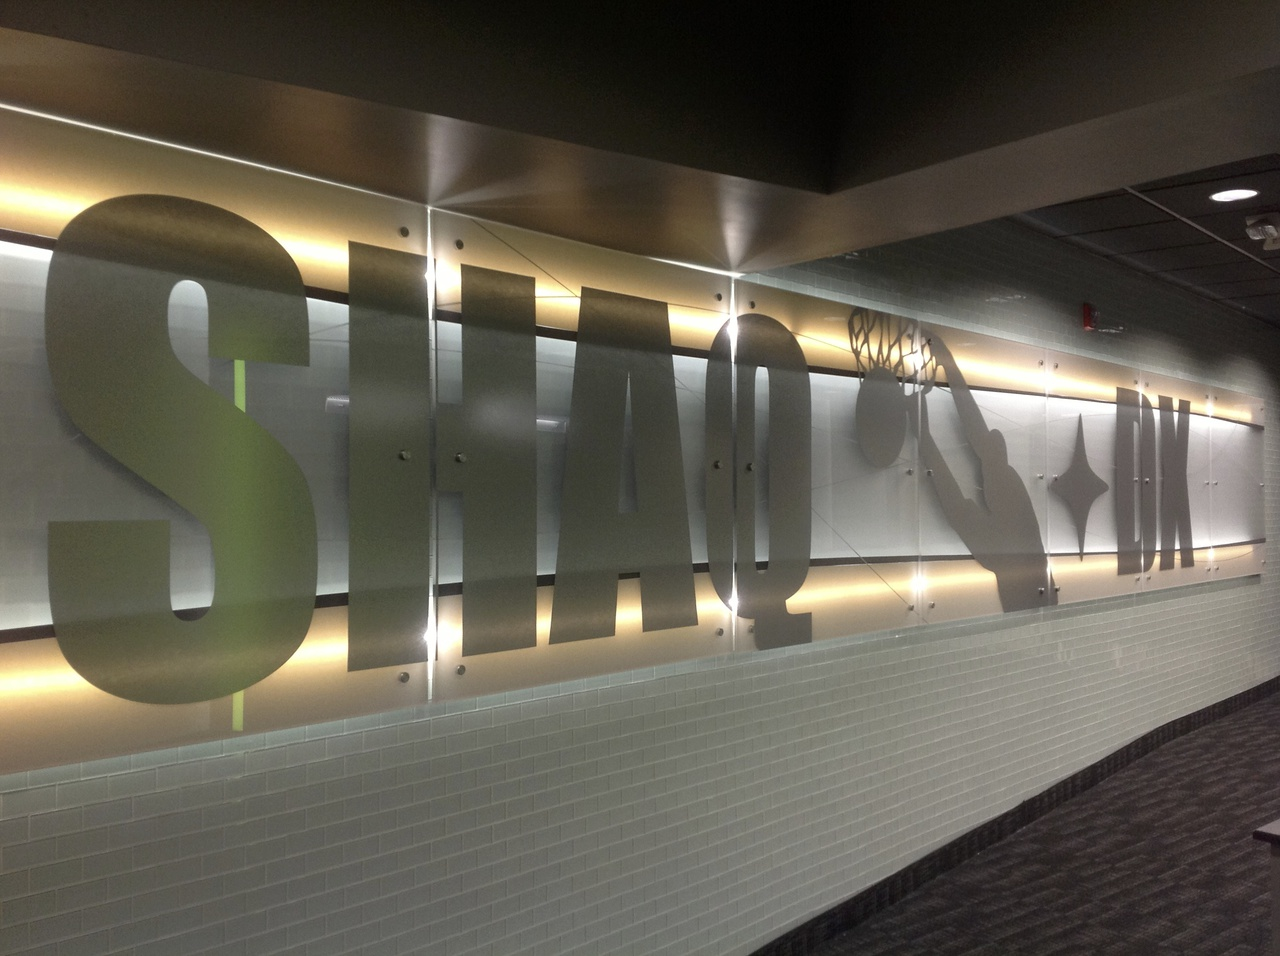 Shaq DX Theater & CityPlex 12 Newark azcodes.com